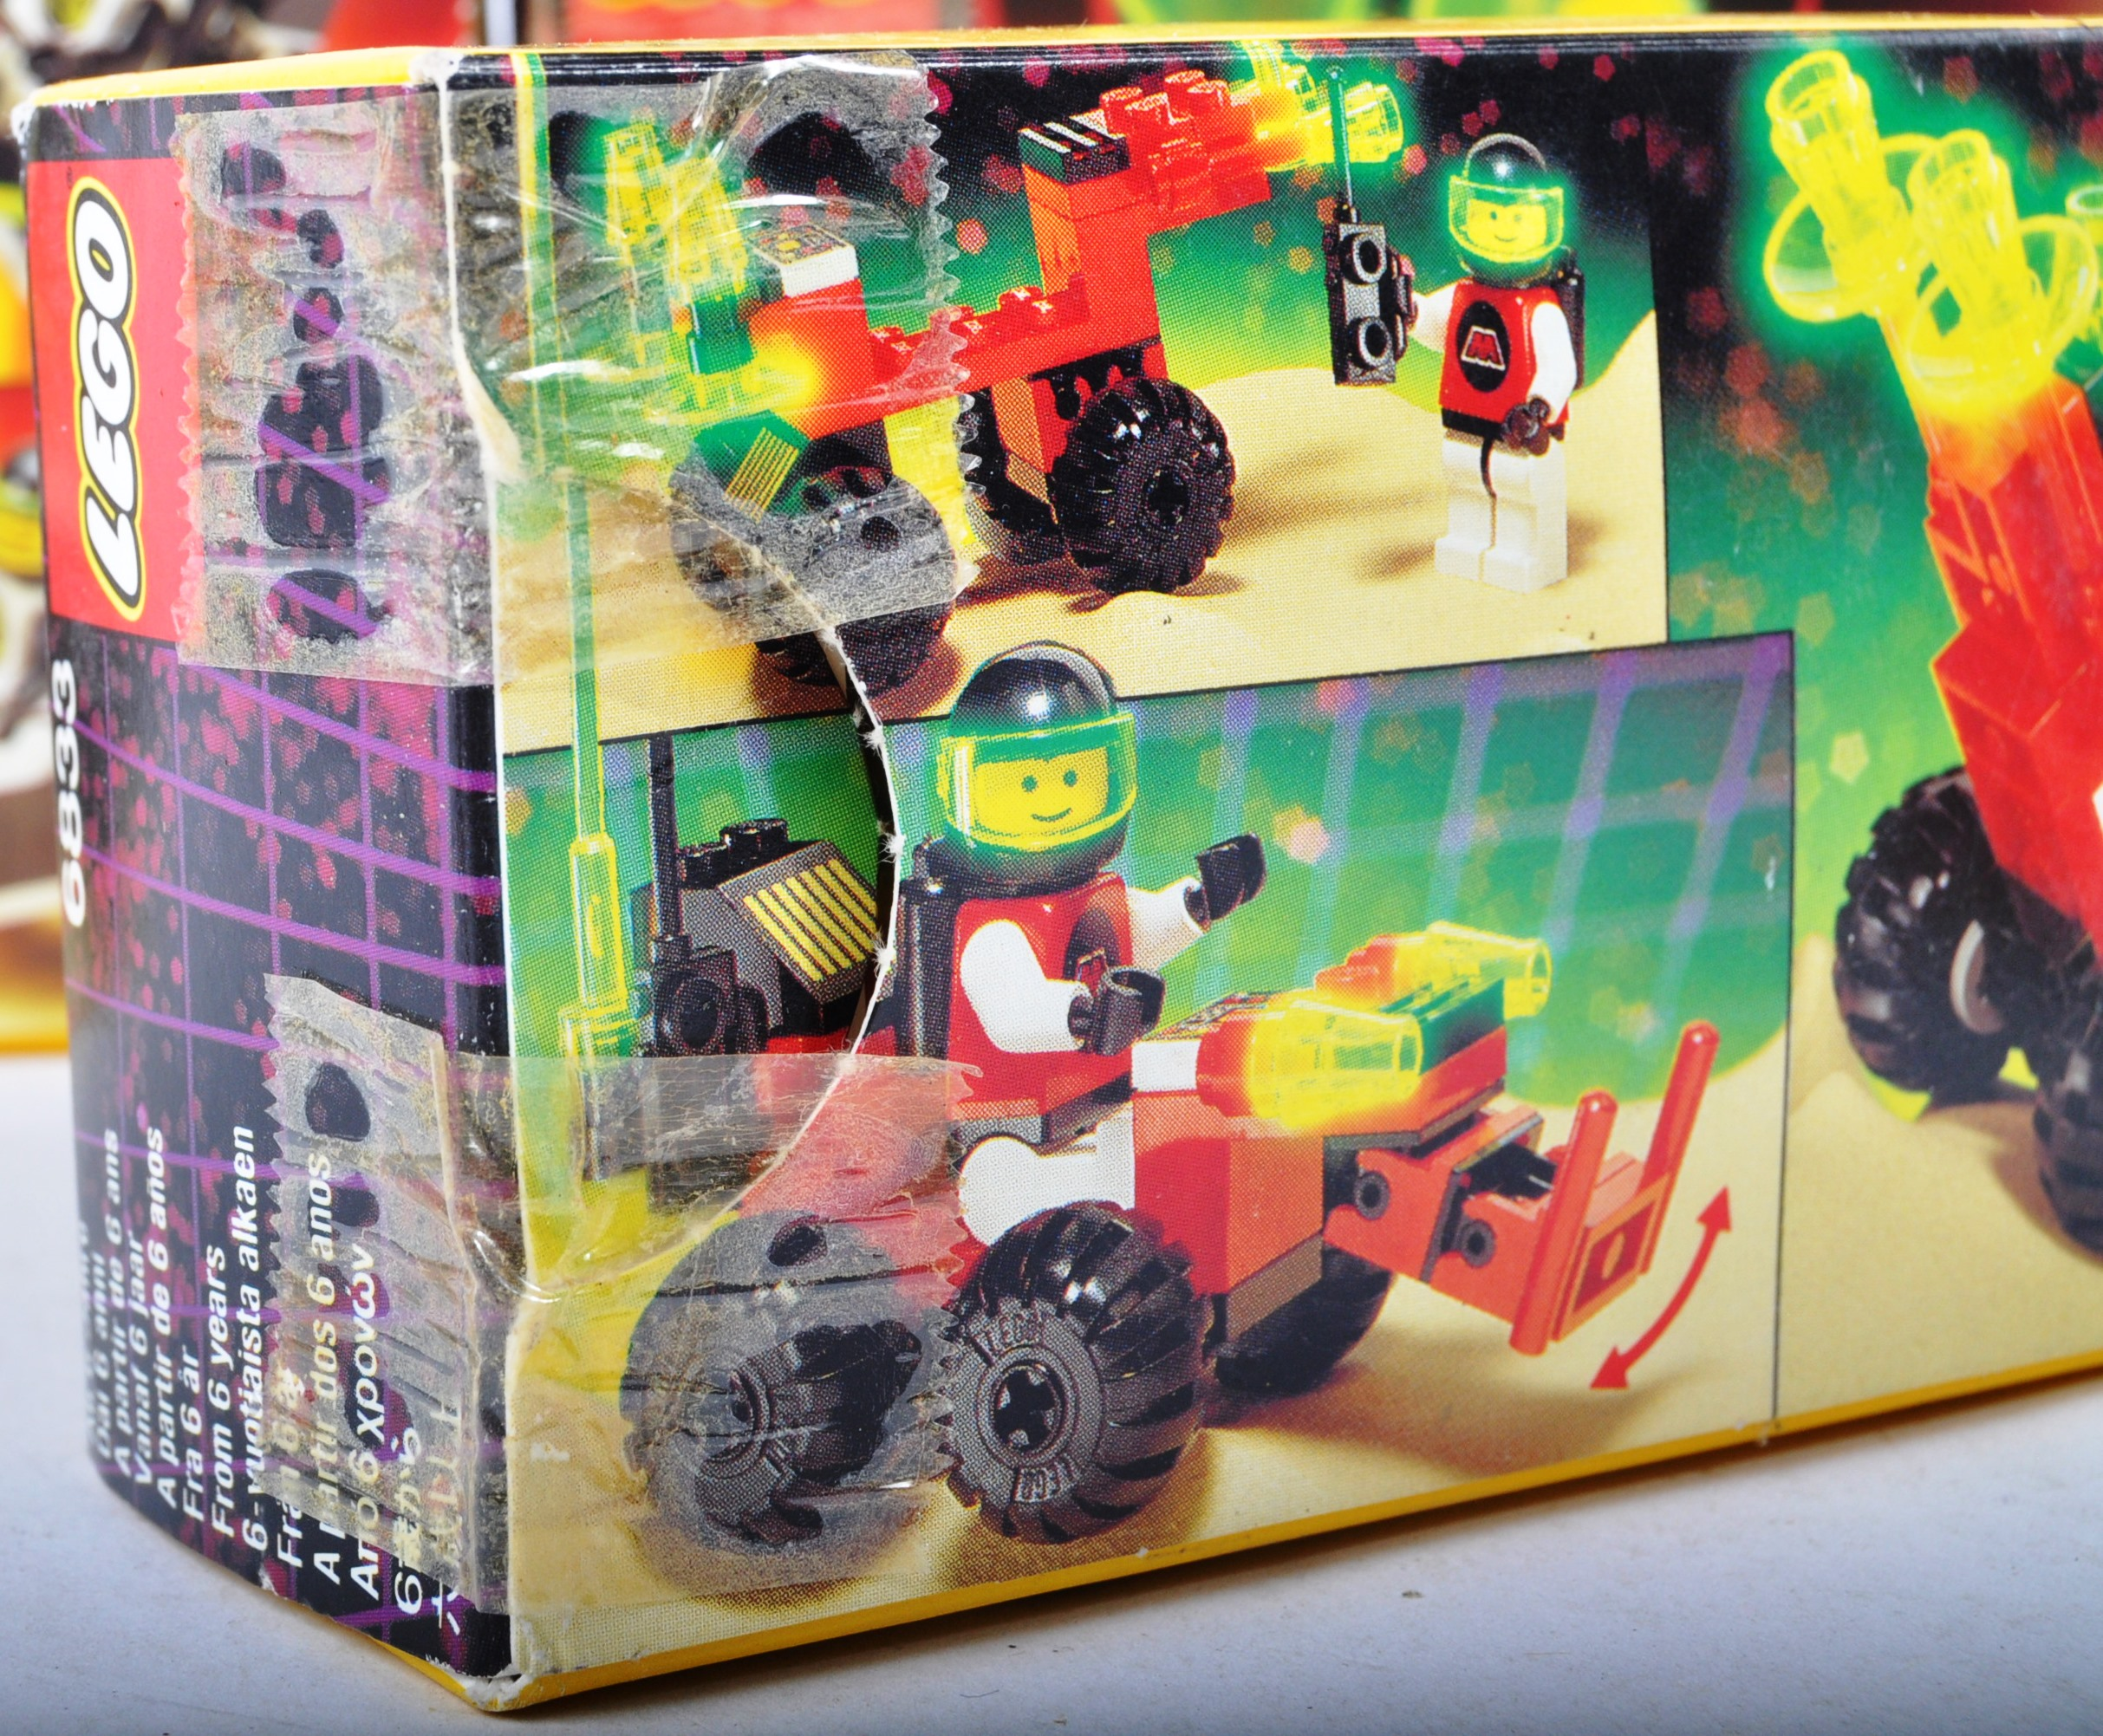 LEGO SETS - BLACKTRON - 6832 / 6833 / 6851 / 6878 / 6887 - Image 4 of 10